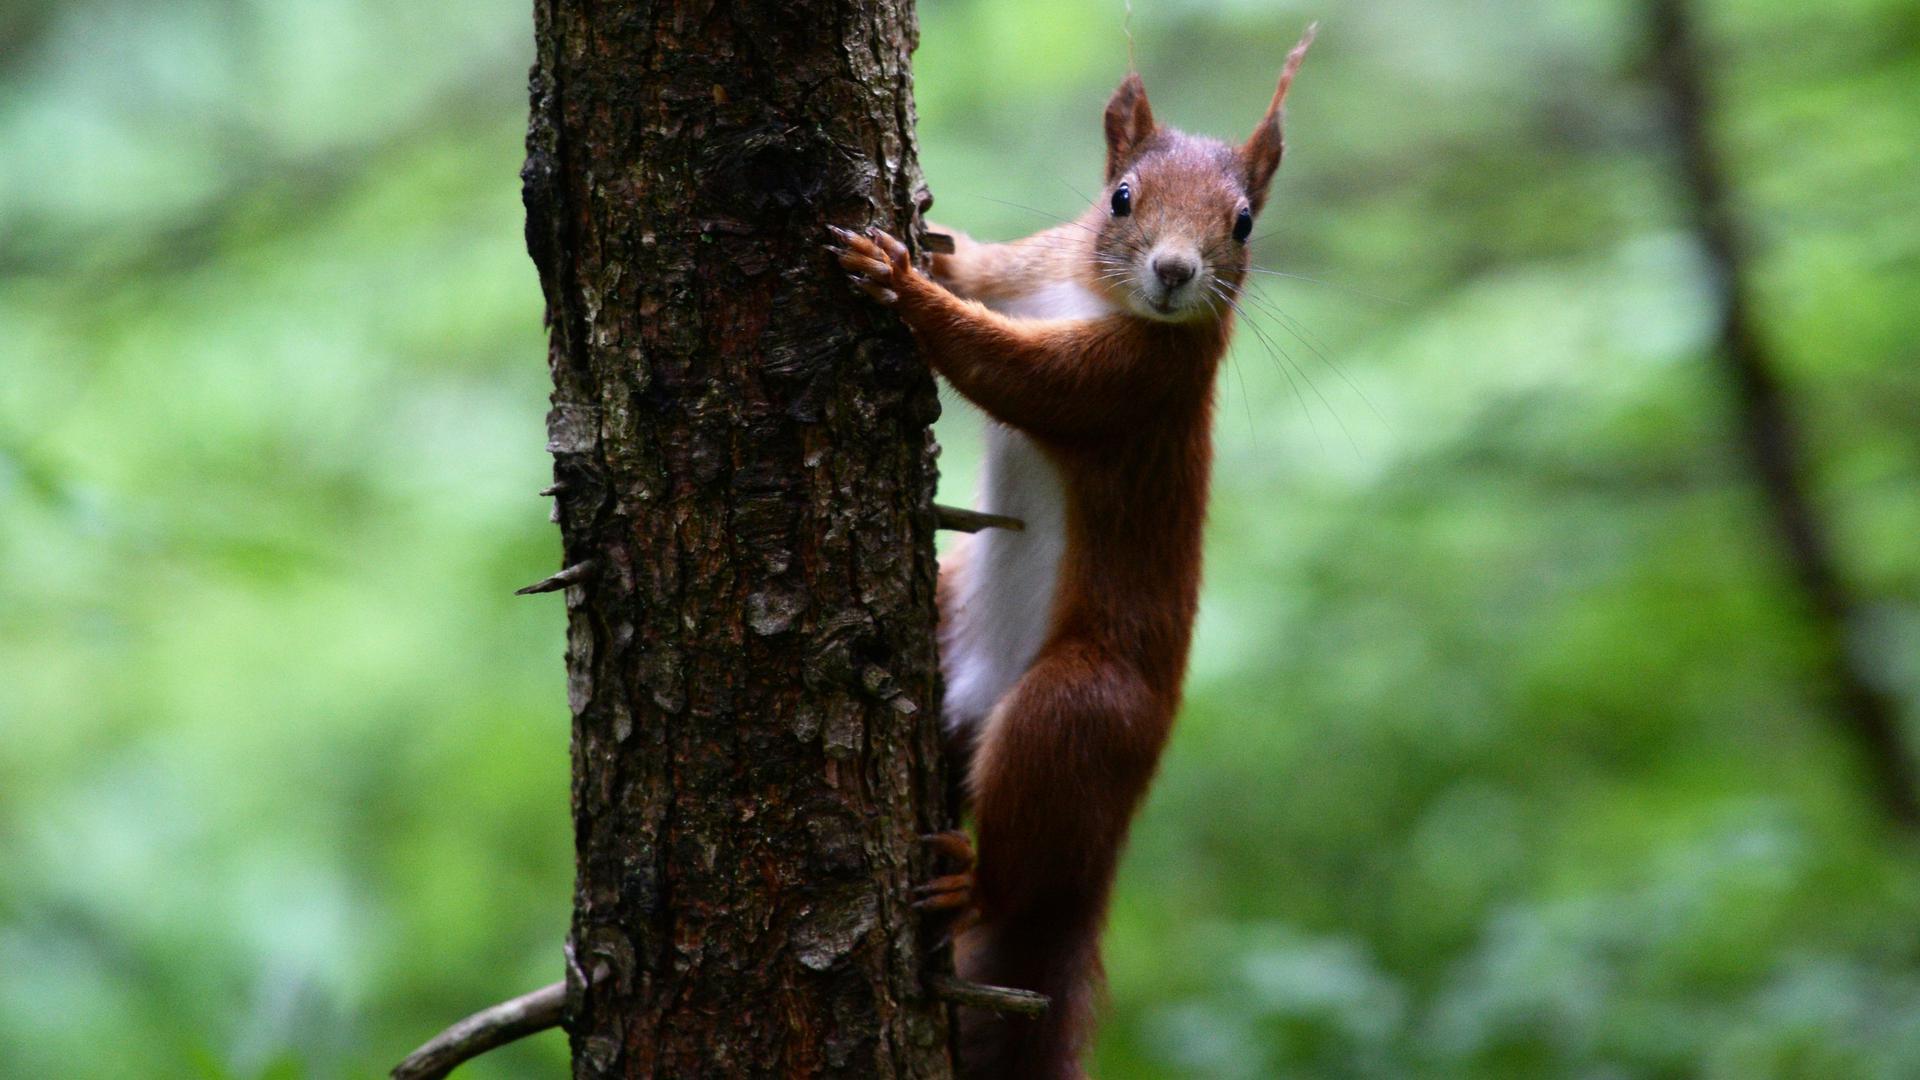 Êin Einhörnchen hält sich am 19.06.2015 bei Hinterzarten (Baden-Württemberg) an einem Baum fest.